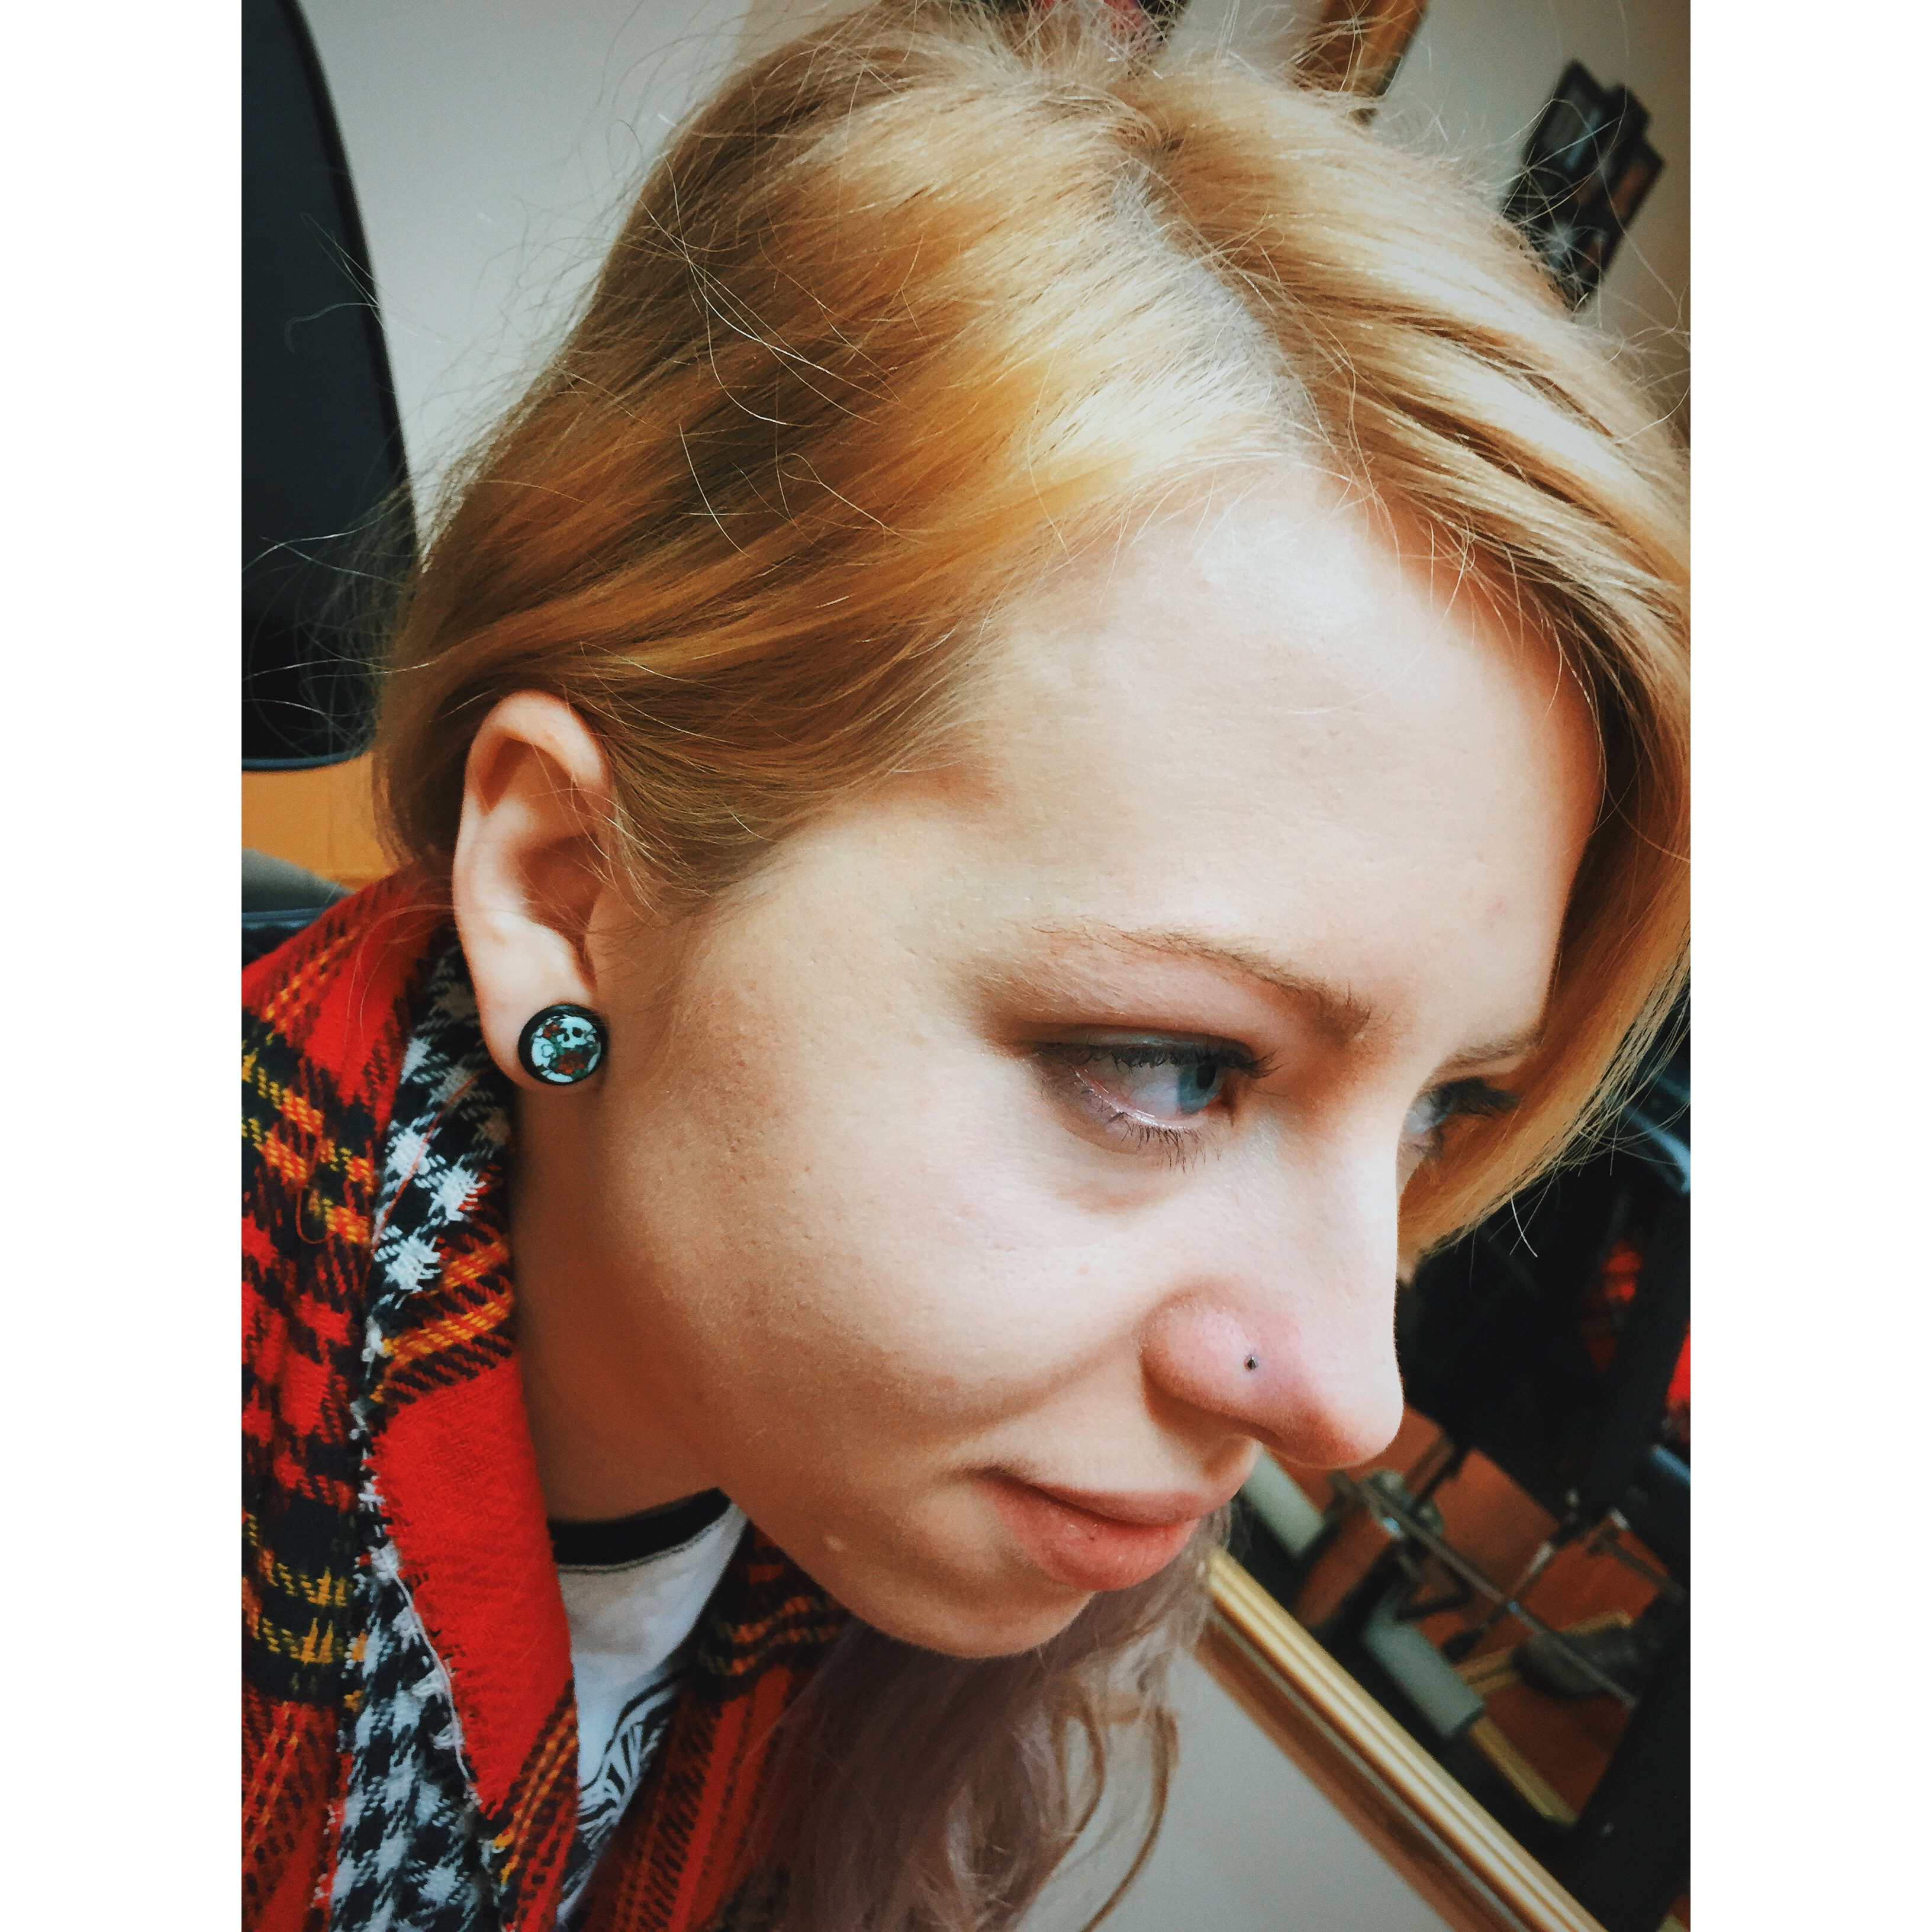 Becca's Nose Piercing